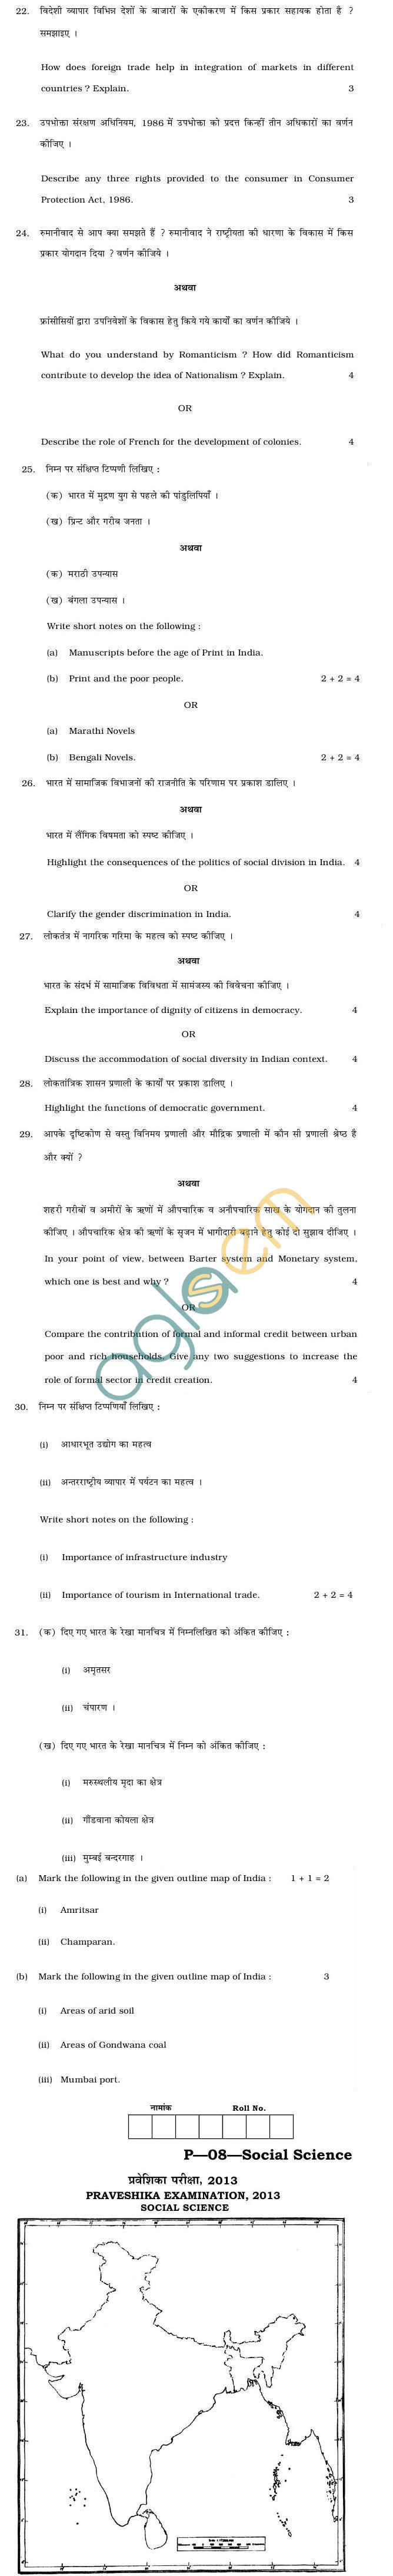 Rajasthan Board Praveshika Social Science Question Paper 2013